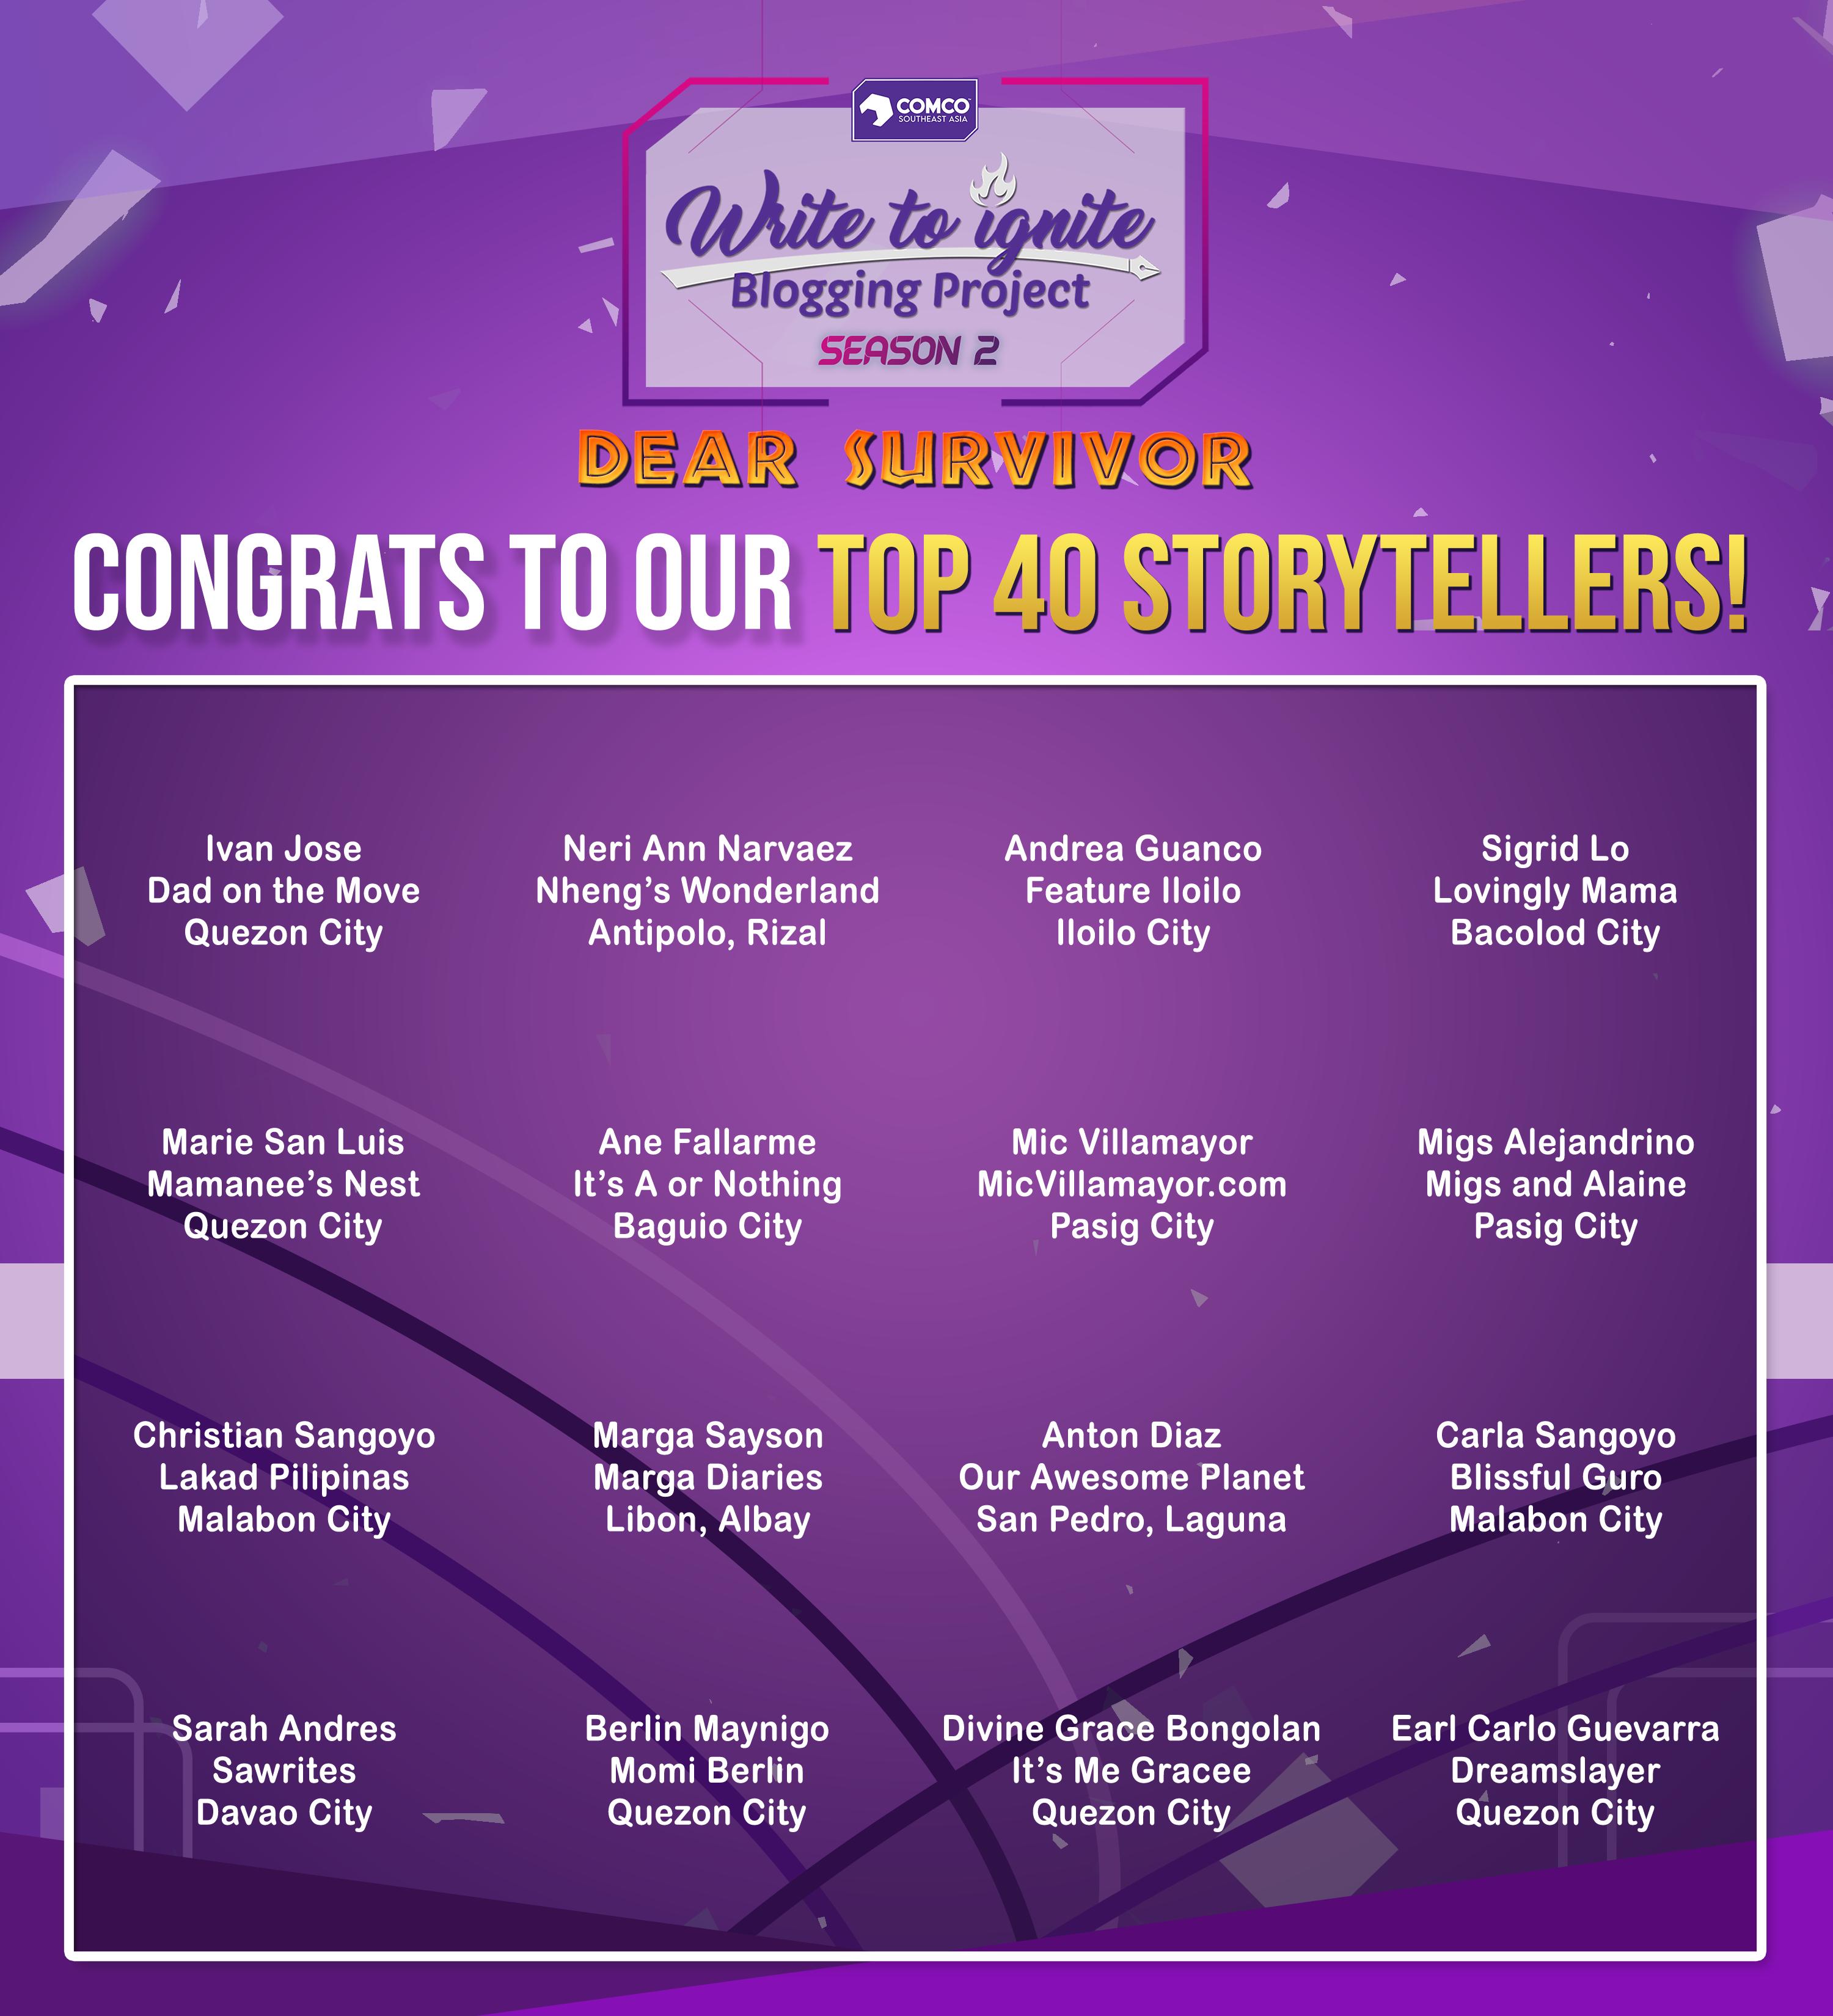 Write to Ignite Season 2 - Top 40 Storytellers - ComCo Southeast Asia - New PR Smart Social - Best agency